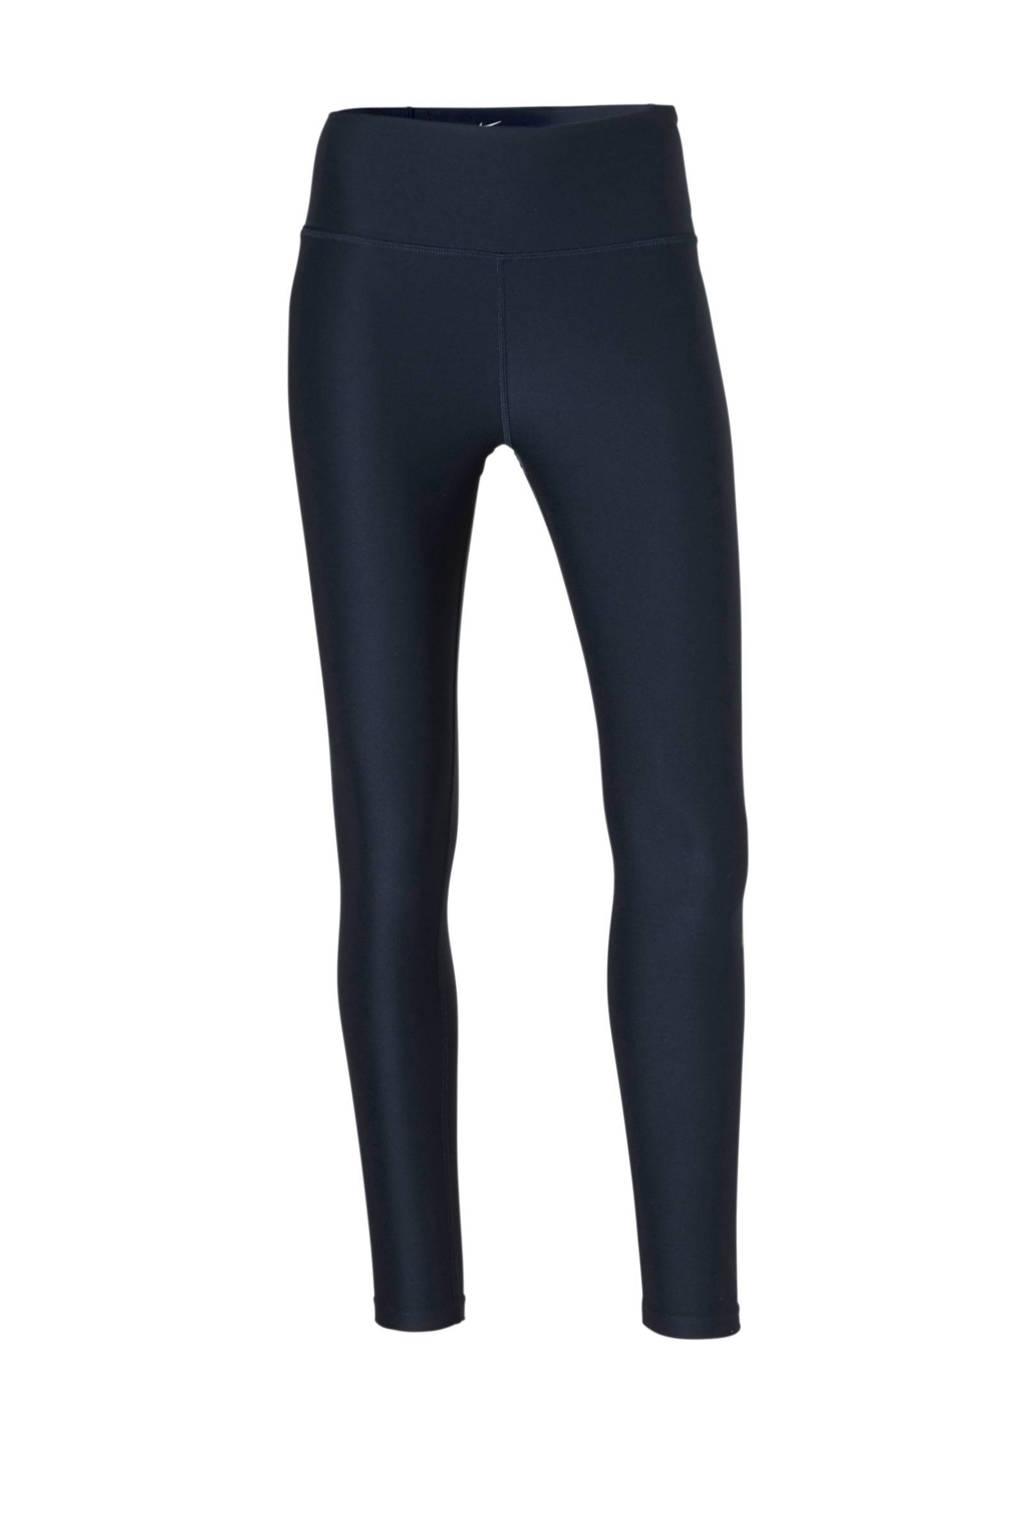 Nike 7/8 sportlegging donkerblauw, Donkerblauw